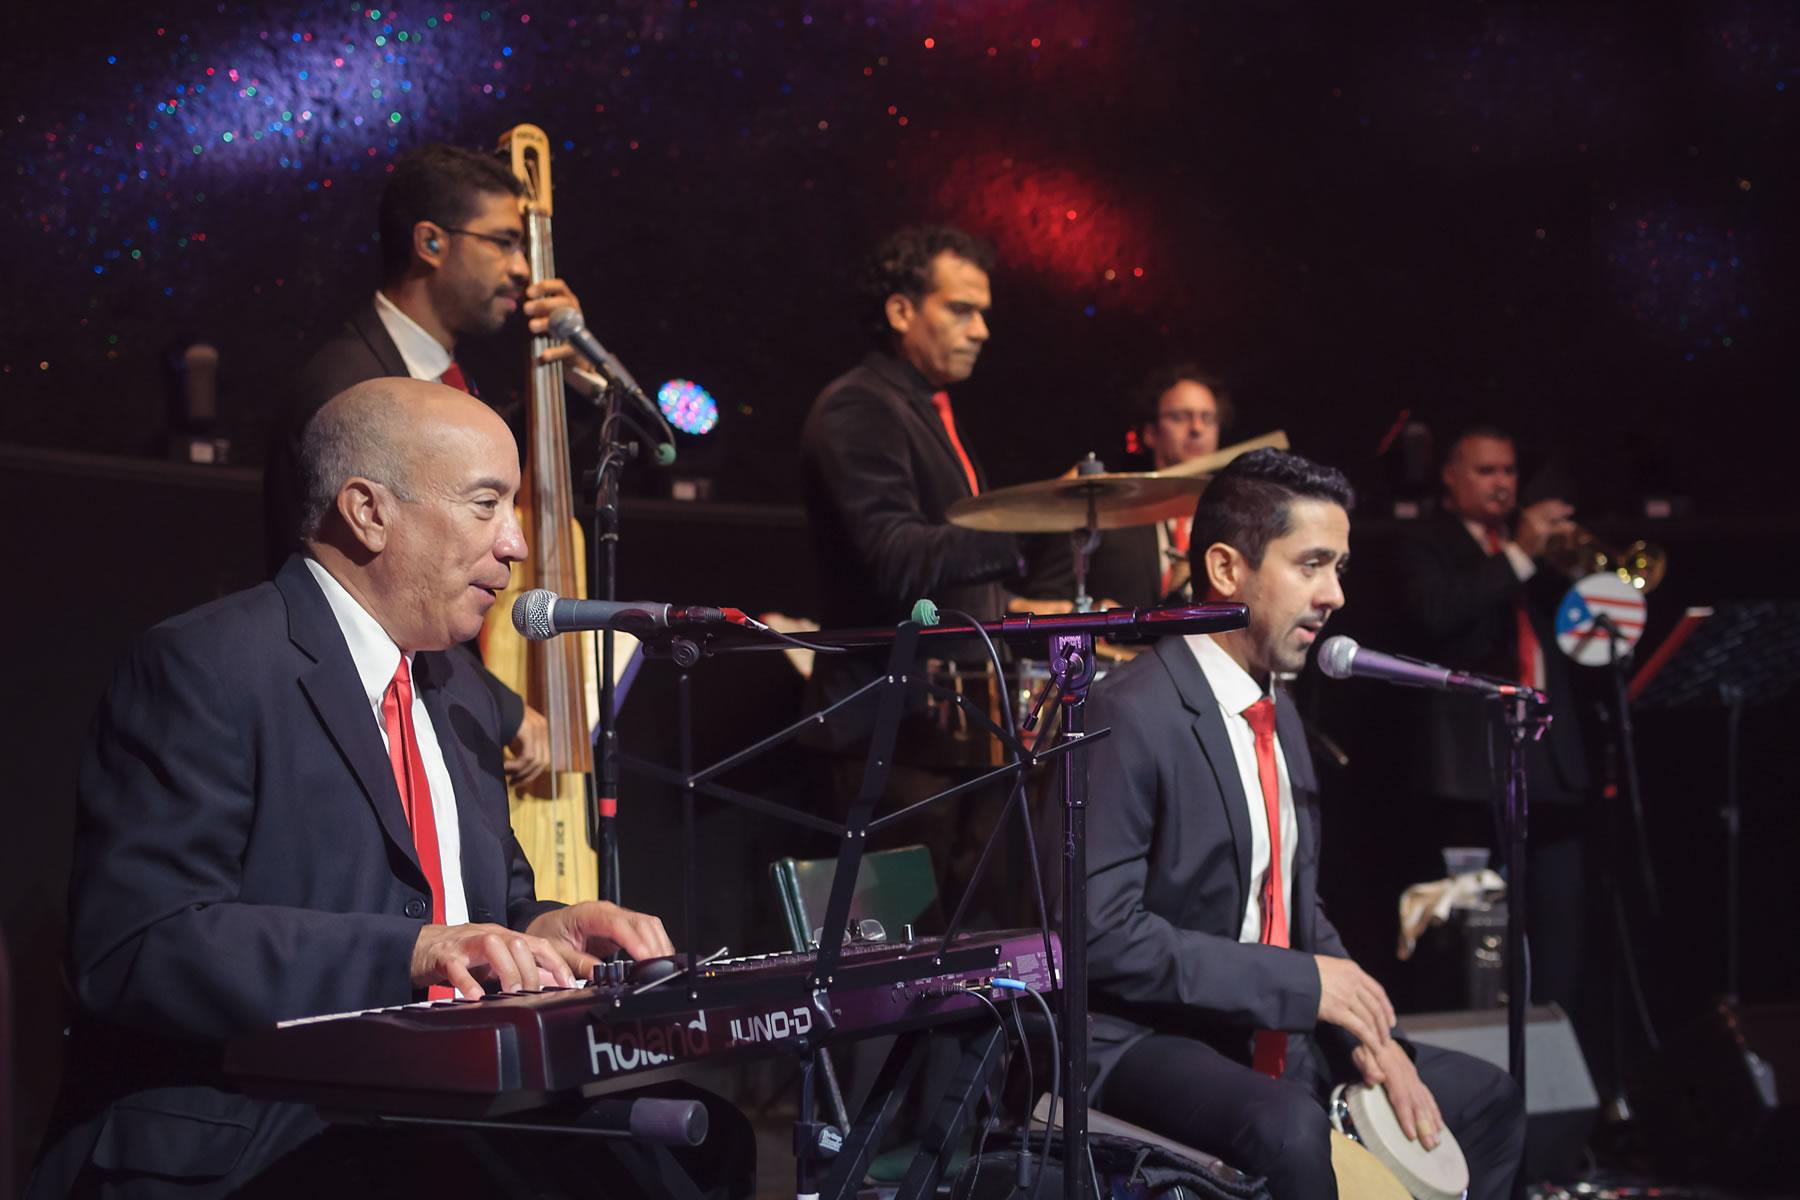 Sonido-Costeno-orchestra-relief-layered-picture-Empire-City-Yonkers-Raceway-Casino-concert